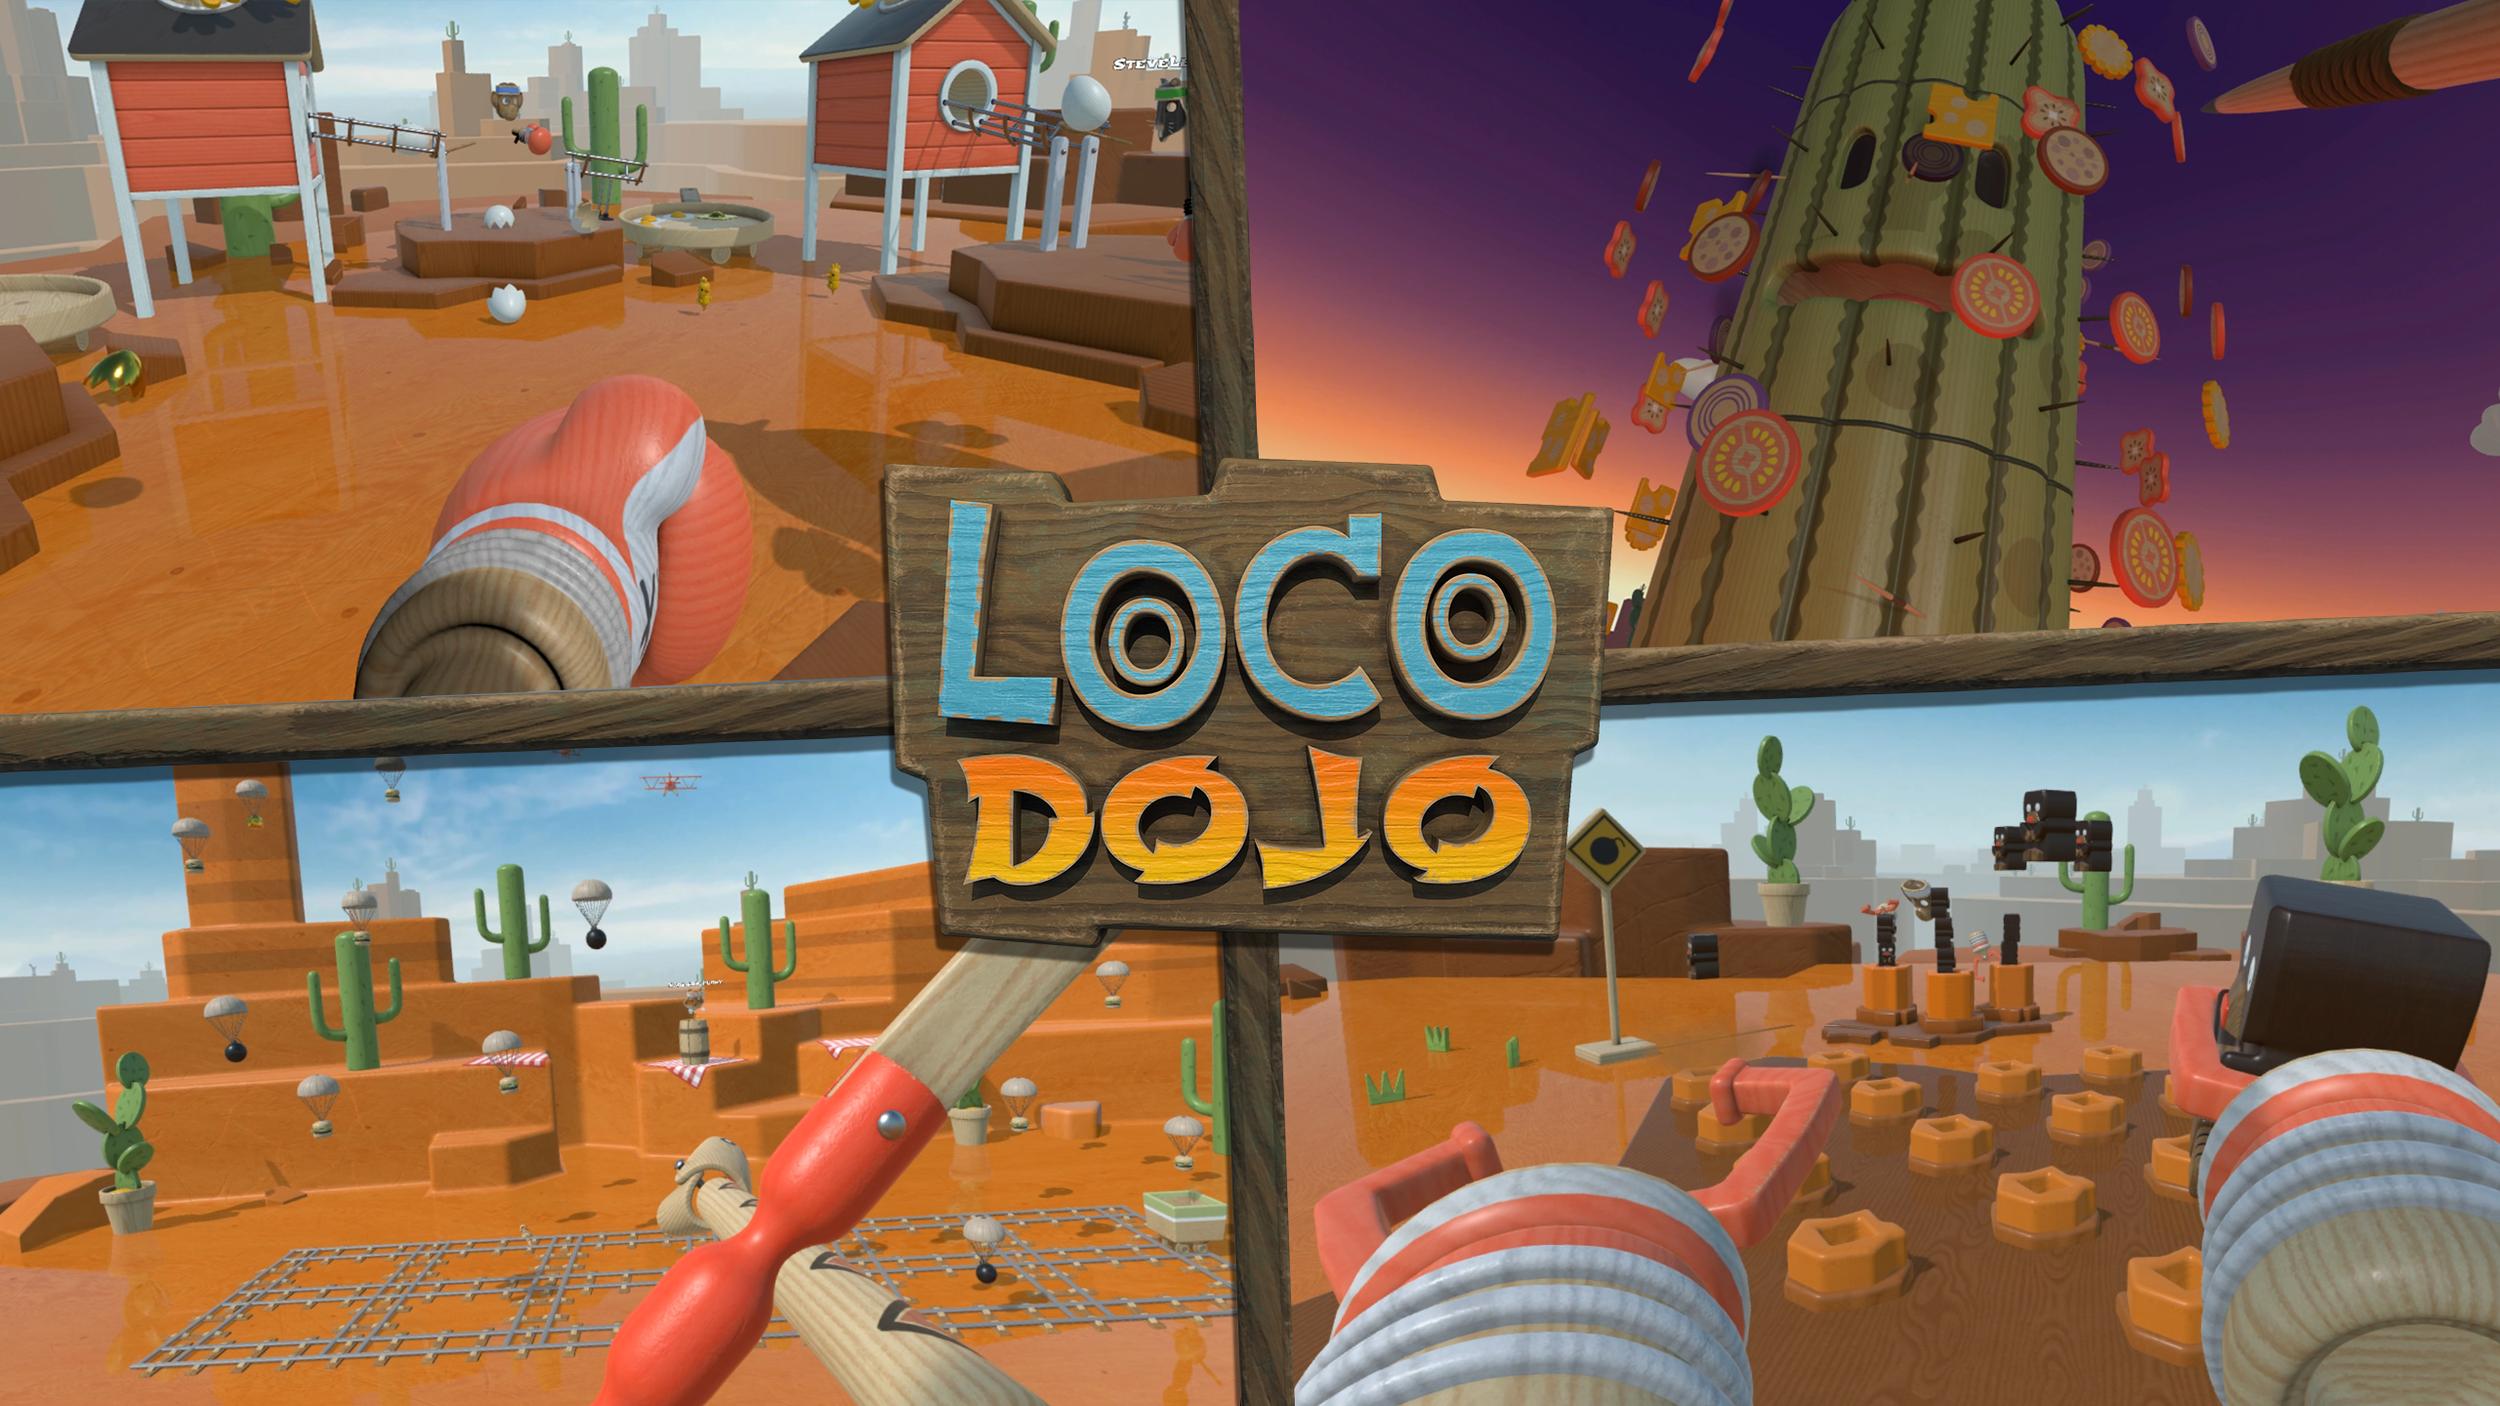 LocoDojoScreenshot_RockyDesert.png